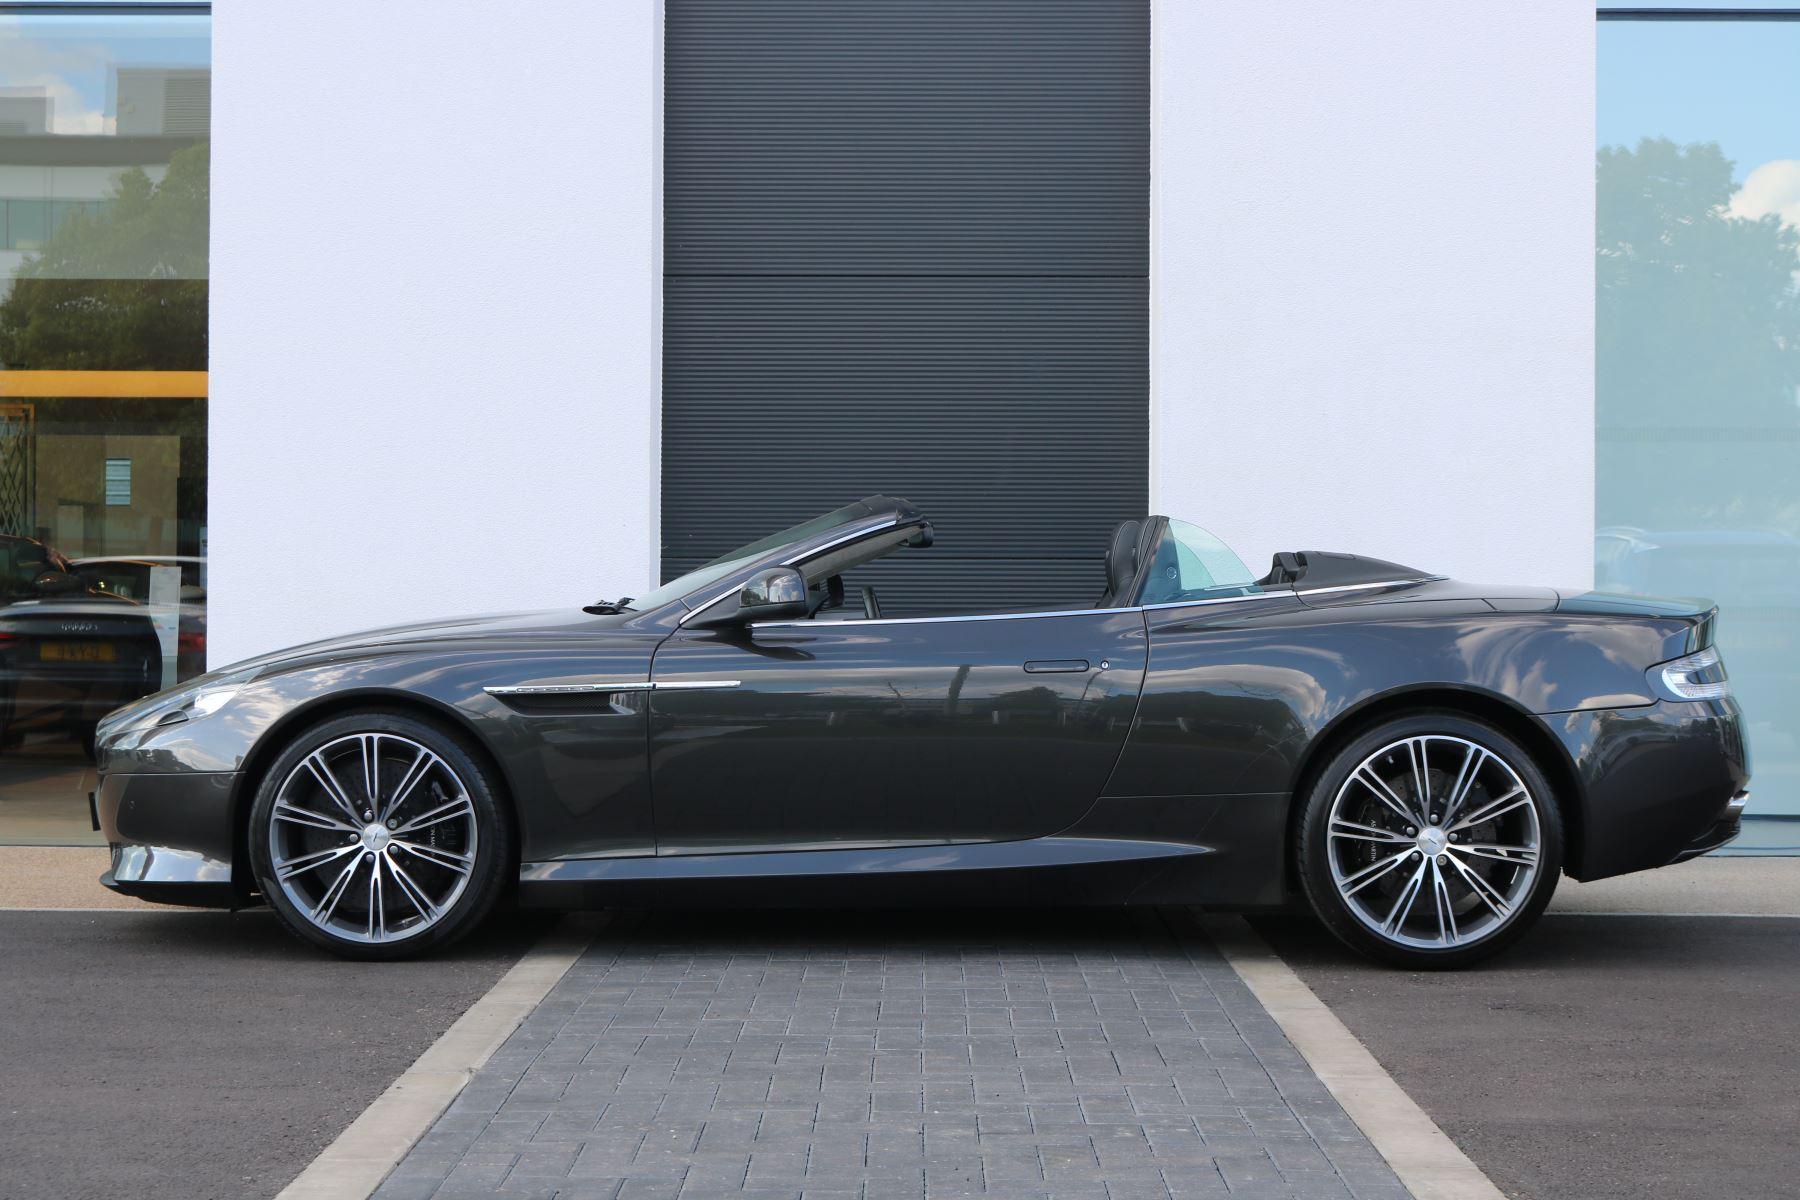 Aston Martin Virage V12 2dr Volante Touchtronic image 3